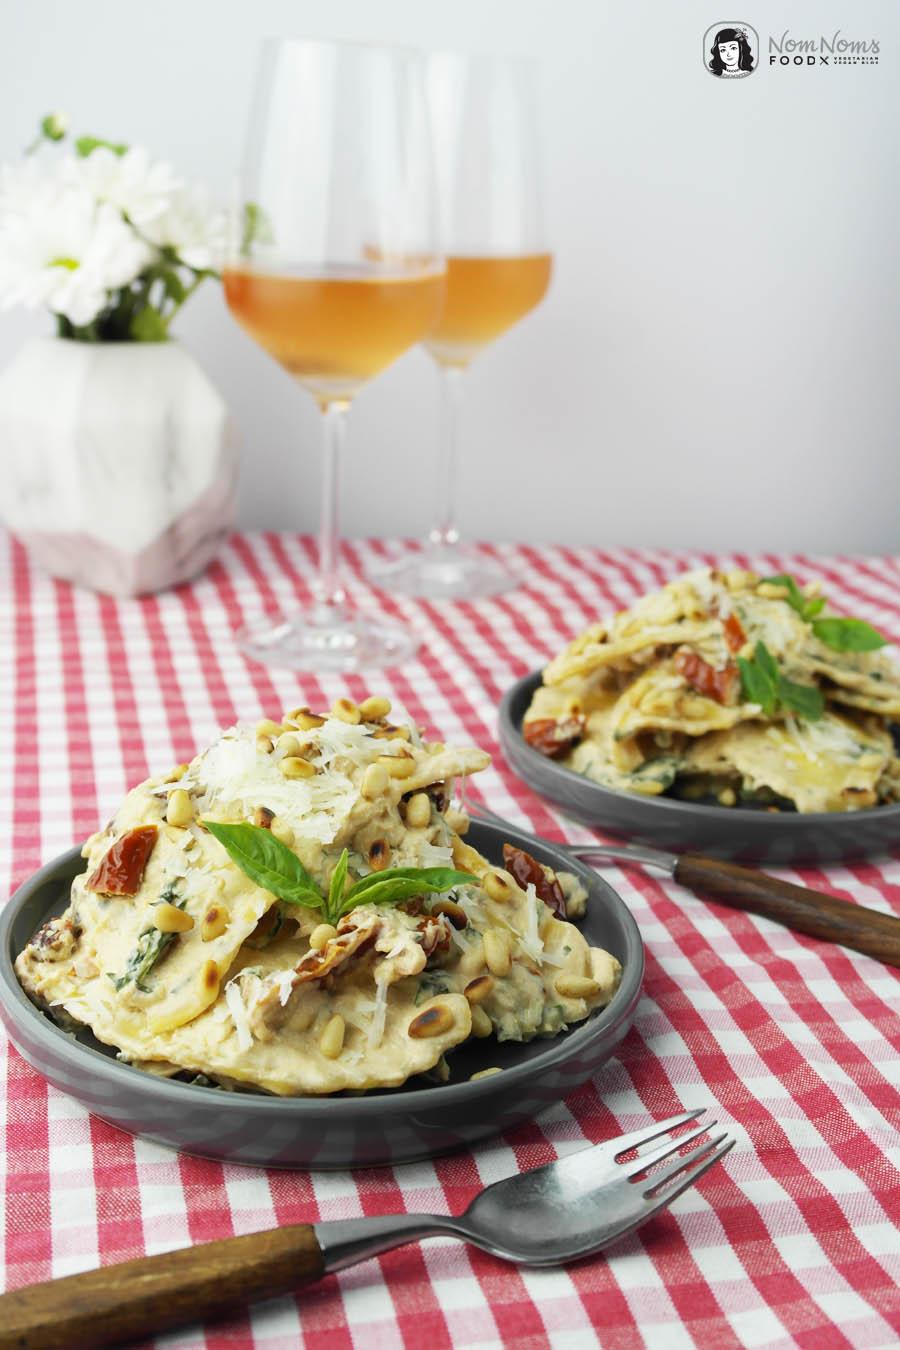 Mozzarella-Mezzelune Pasta mit getrockneten Tomaten in Ricotta-Basilikum-Soße